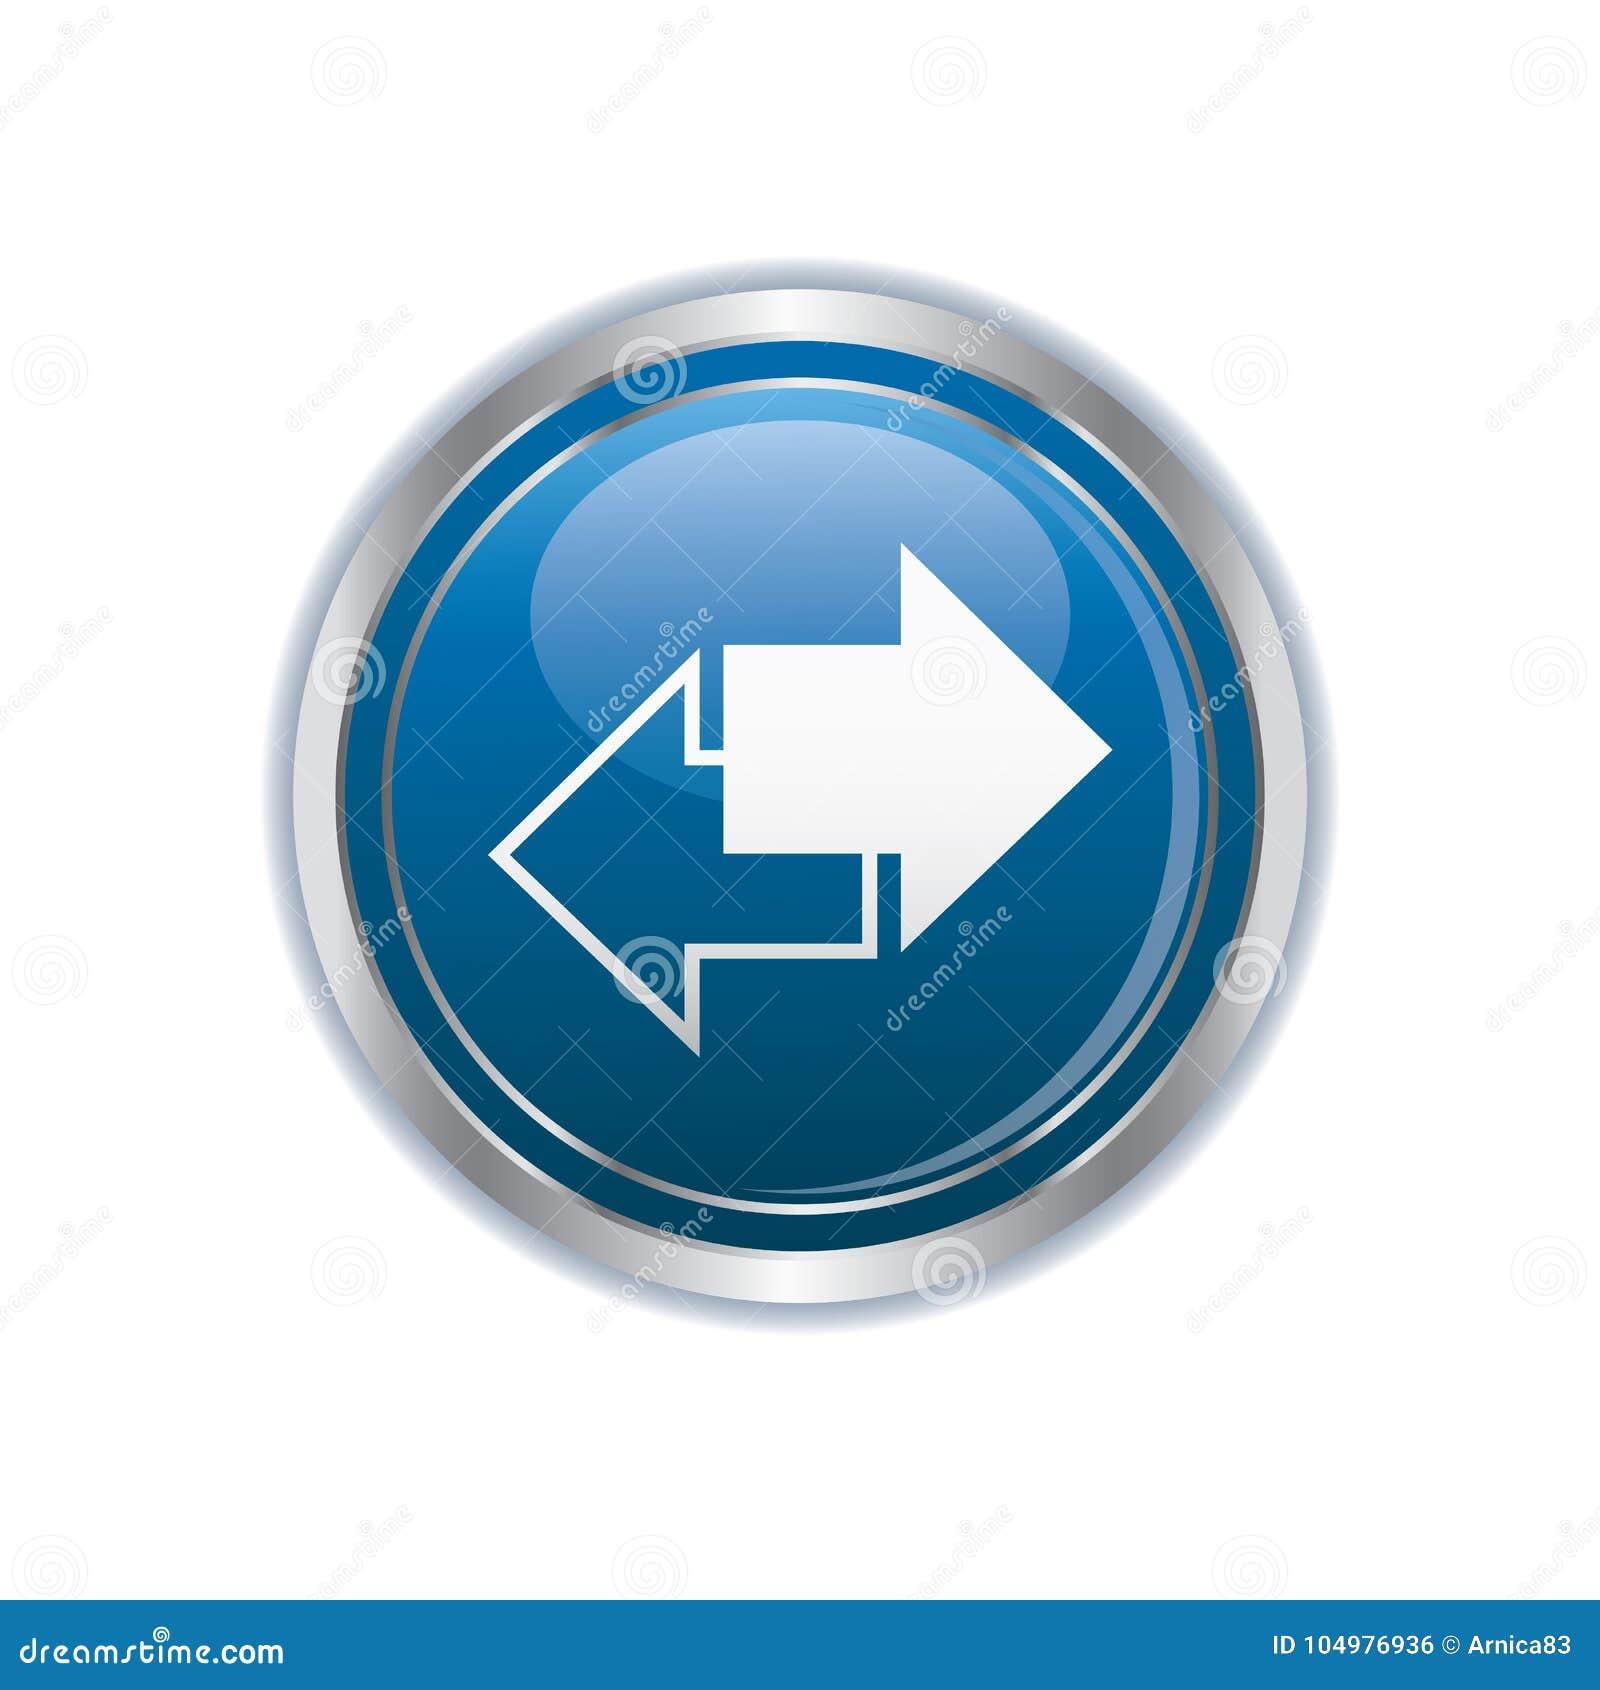 Renew icon on the button